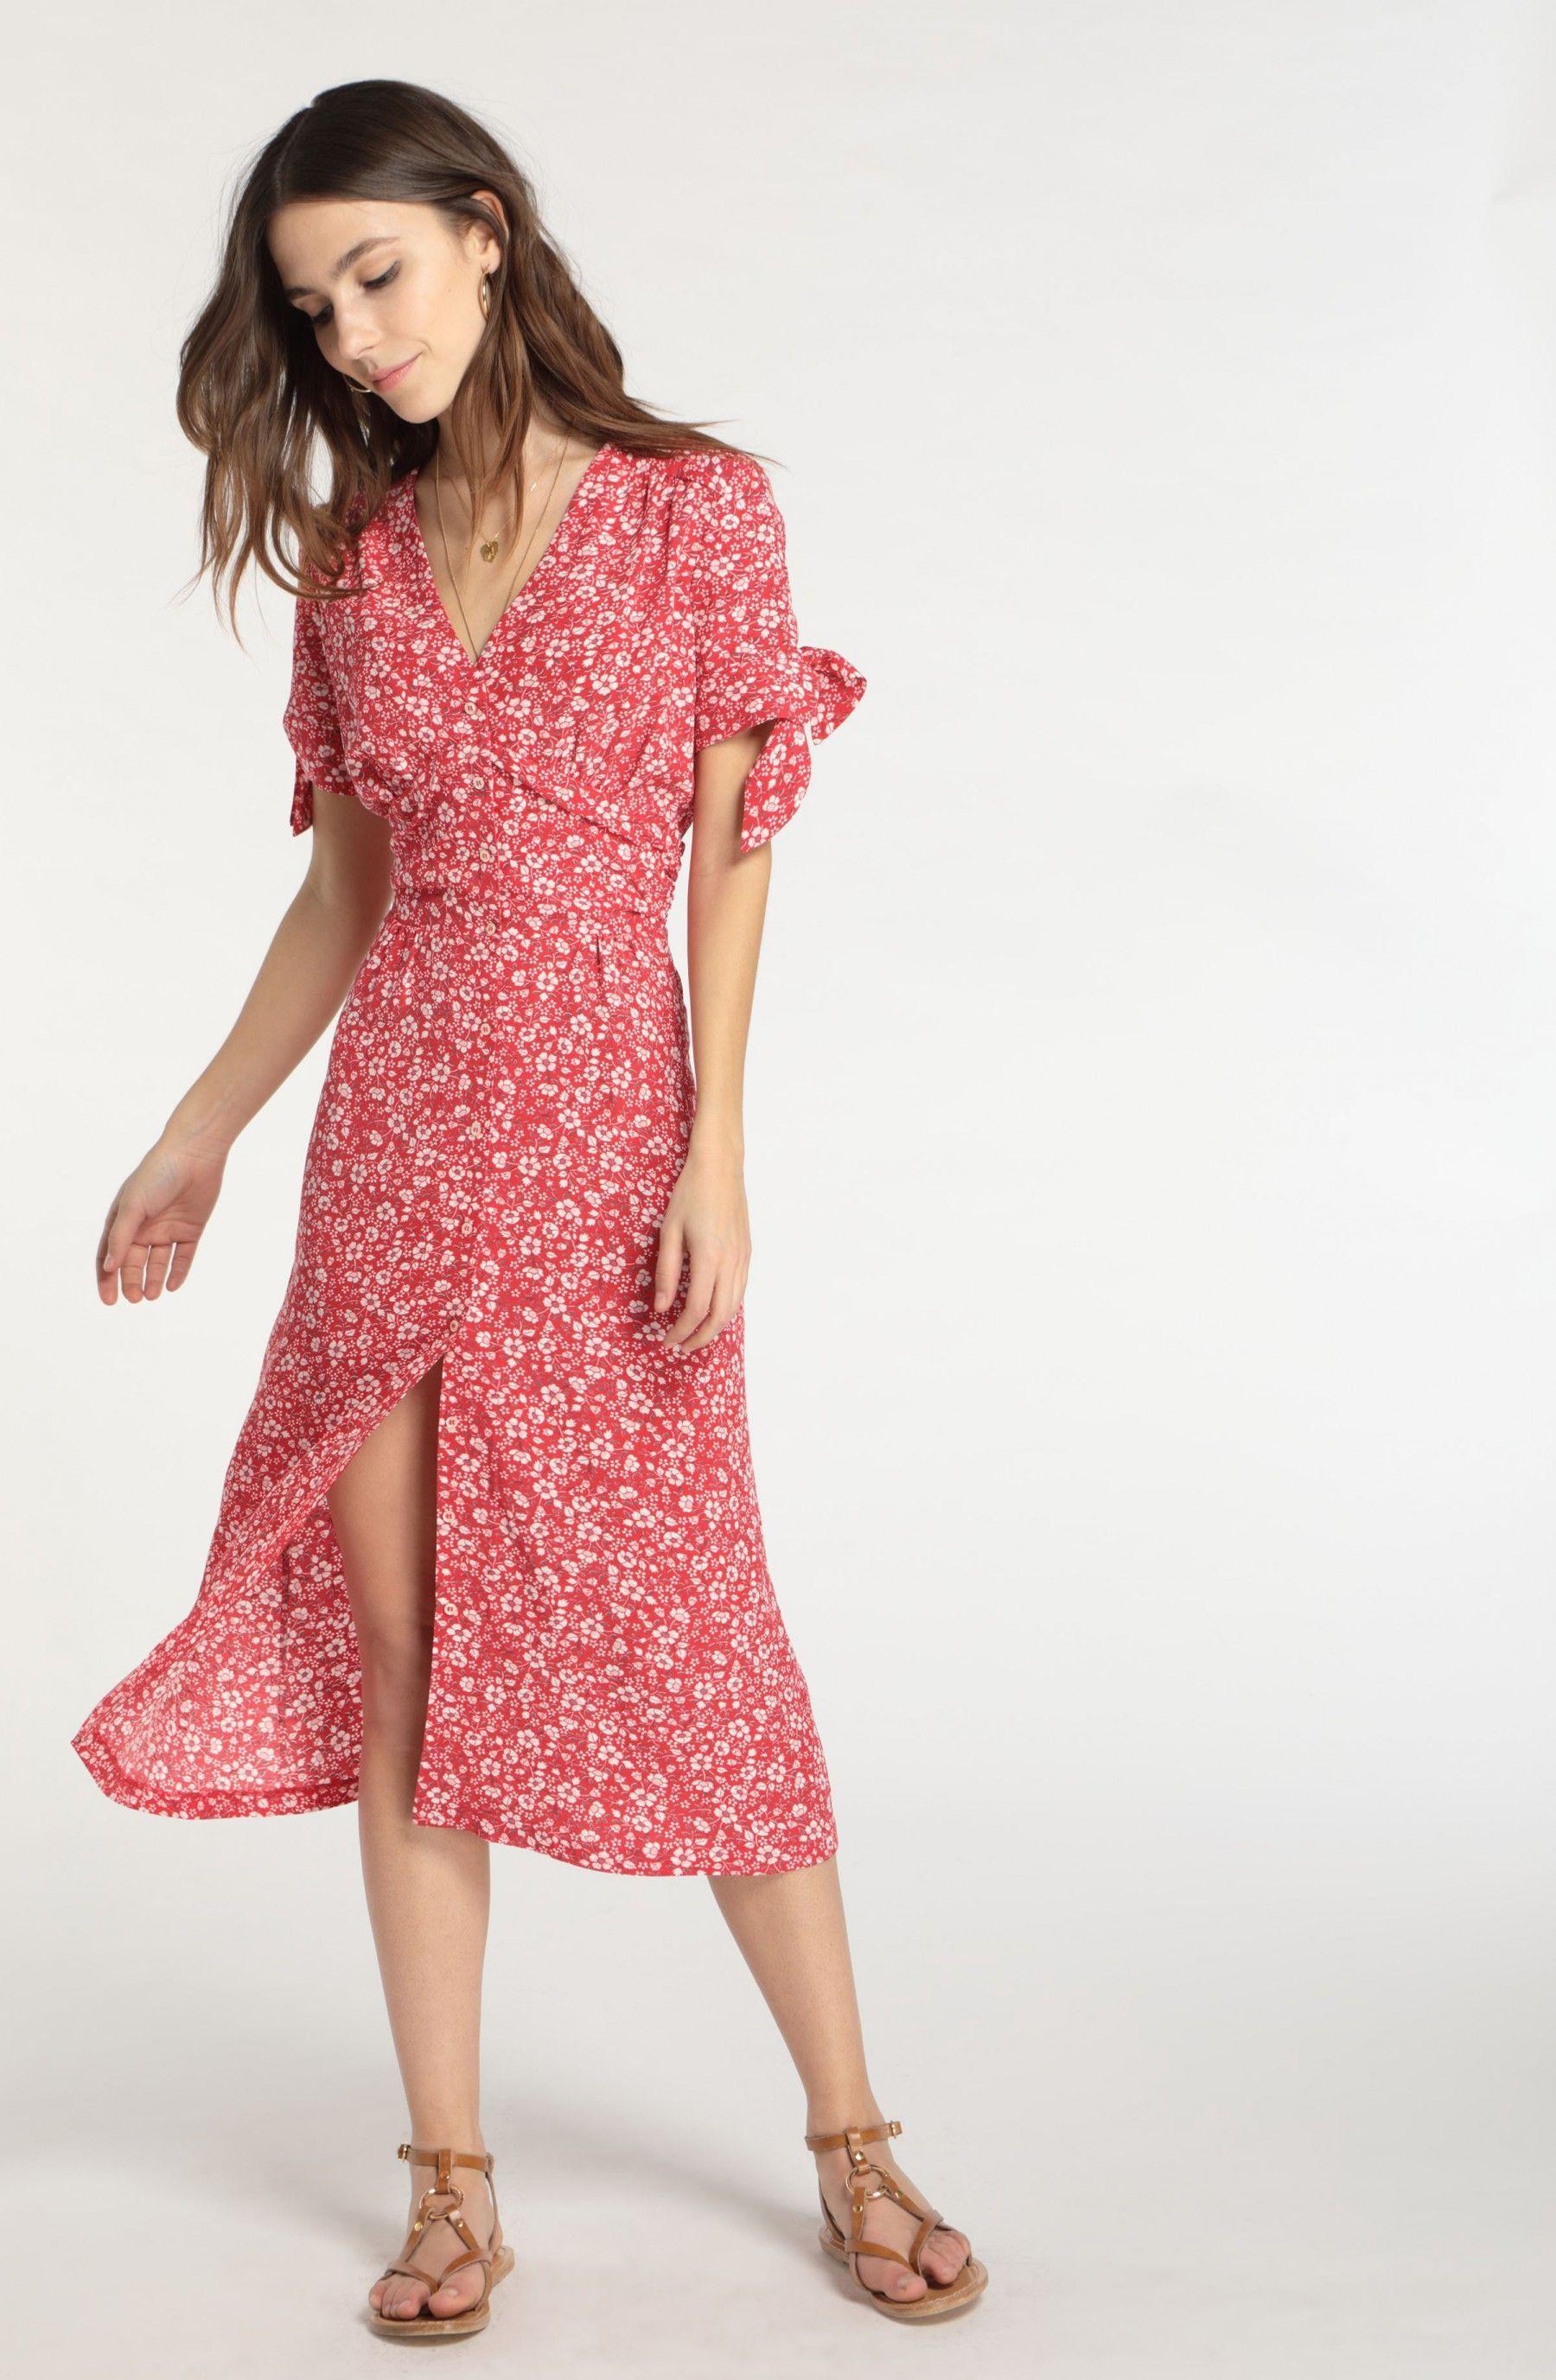 Laura Dresses Clothing